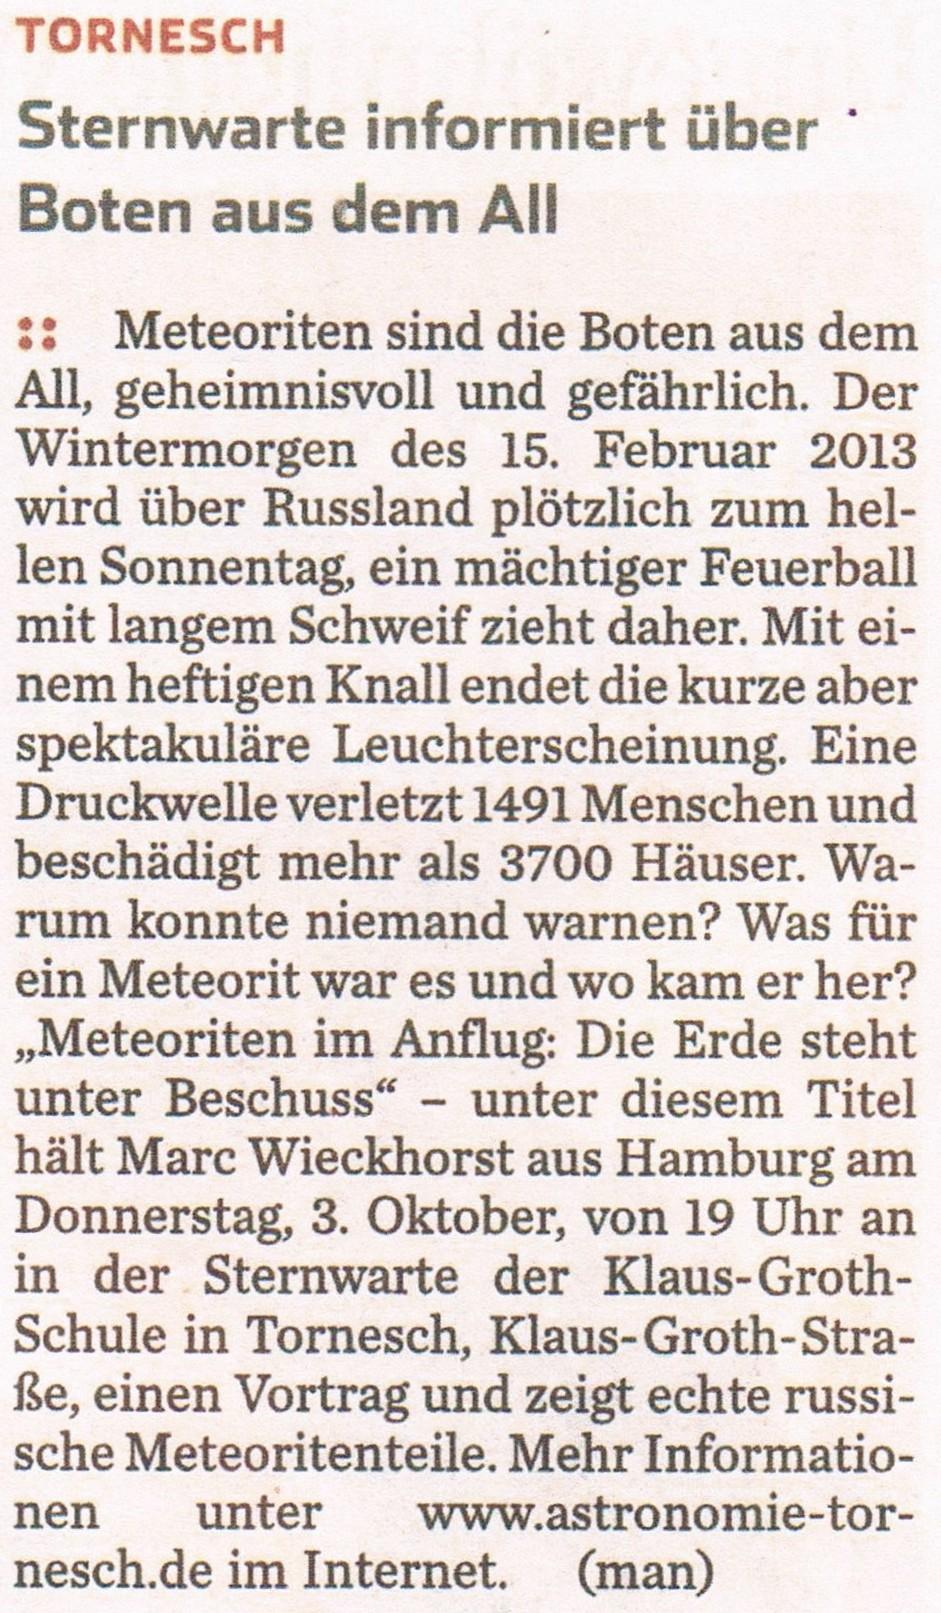 Ankündigung im HH-Abendblatt am 28.09.2013